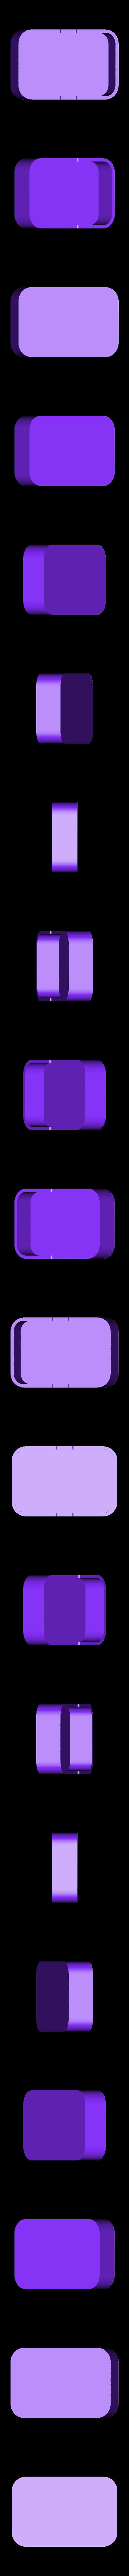 Top.stl Download free STL file Simple Nozzle Holder • 3D print template, victor_arnaiz